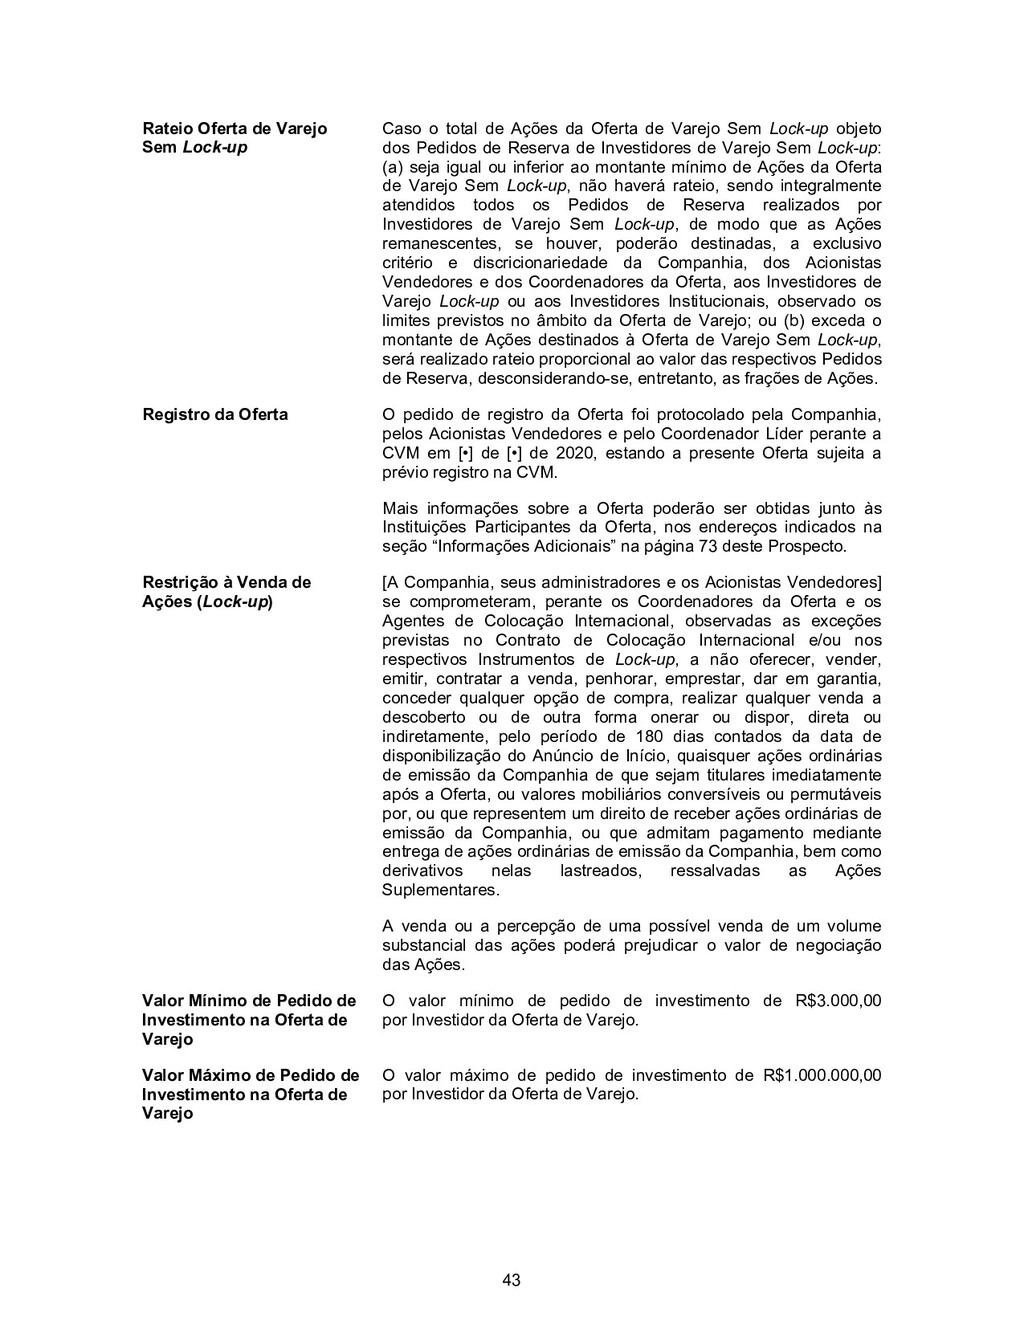 43 Rateio Oferta de Varejo Sem Lock-up Caso o t...